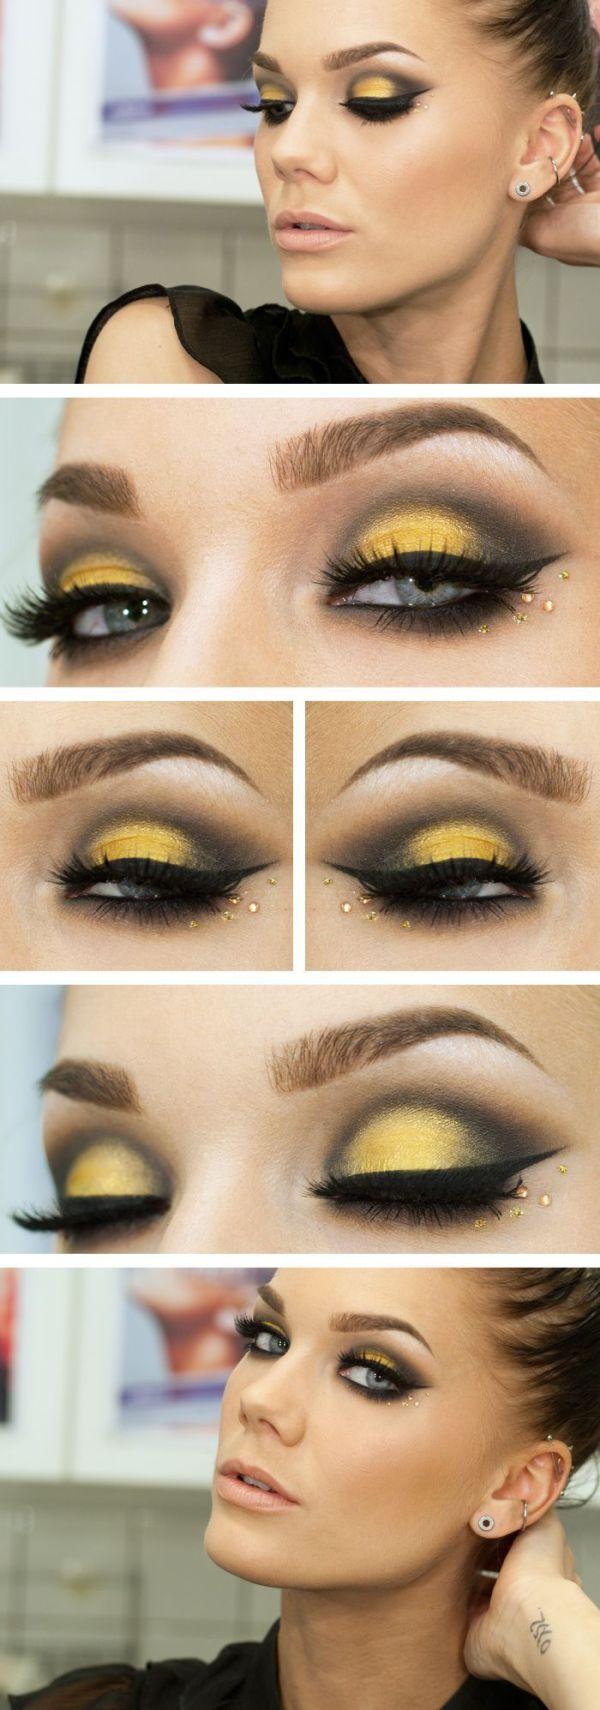 maquillaje-para-disfraz-de-abeja-carnaval-2015-paso-a-paso